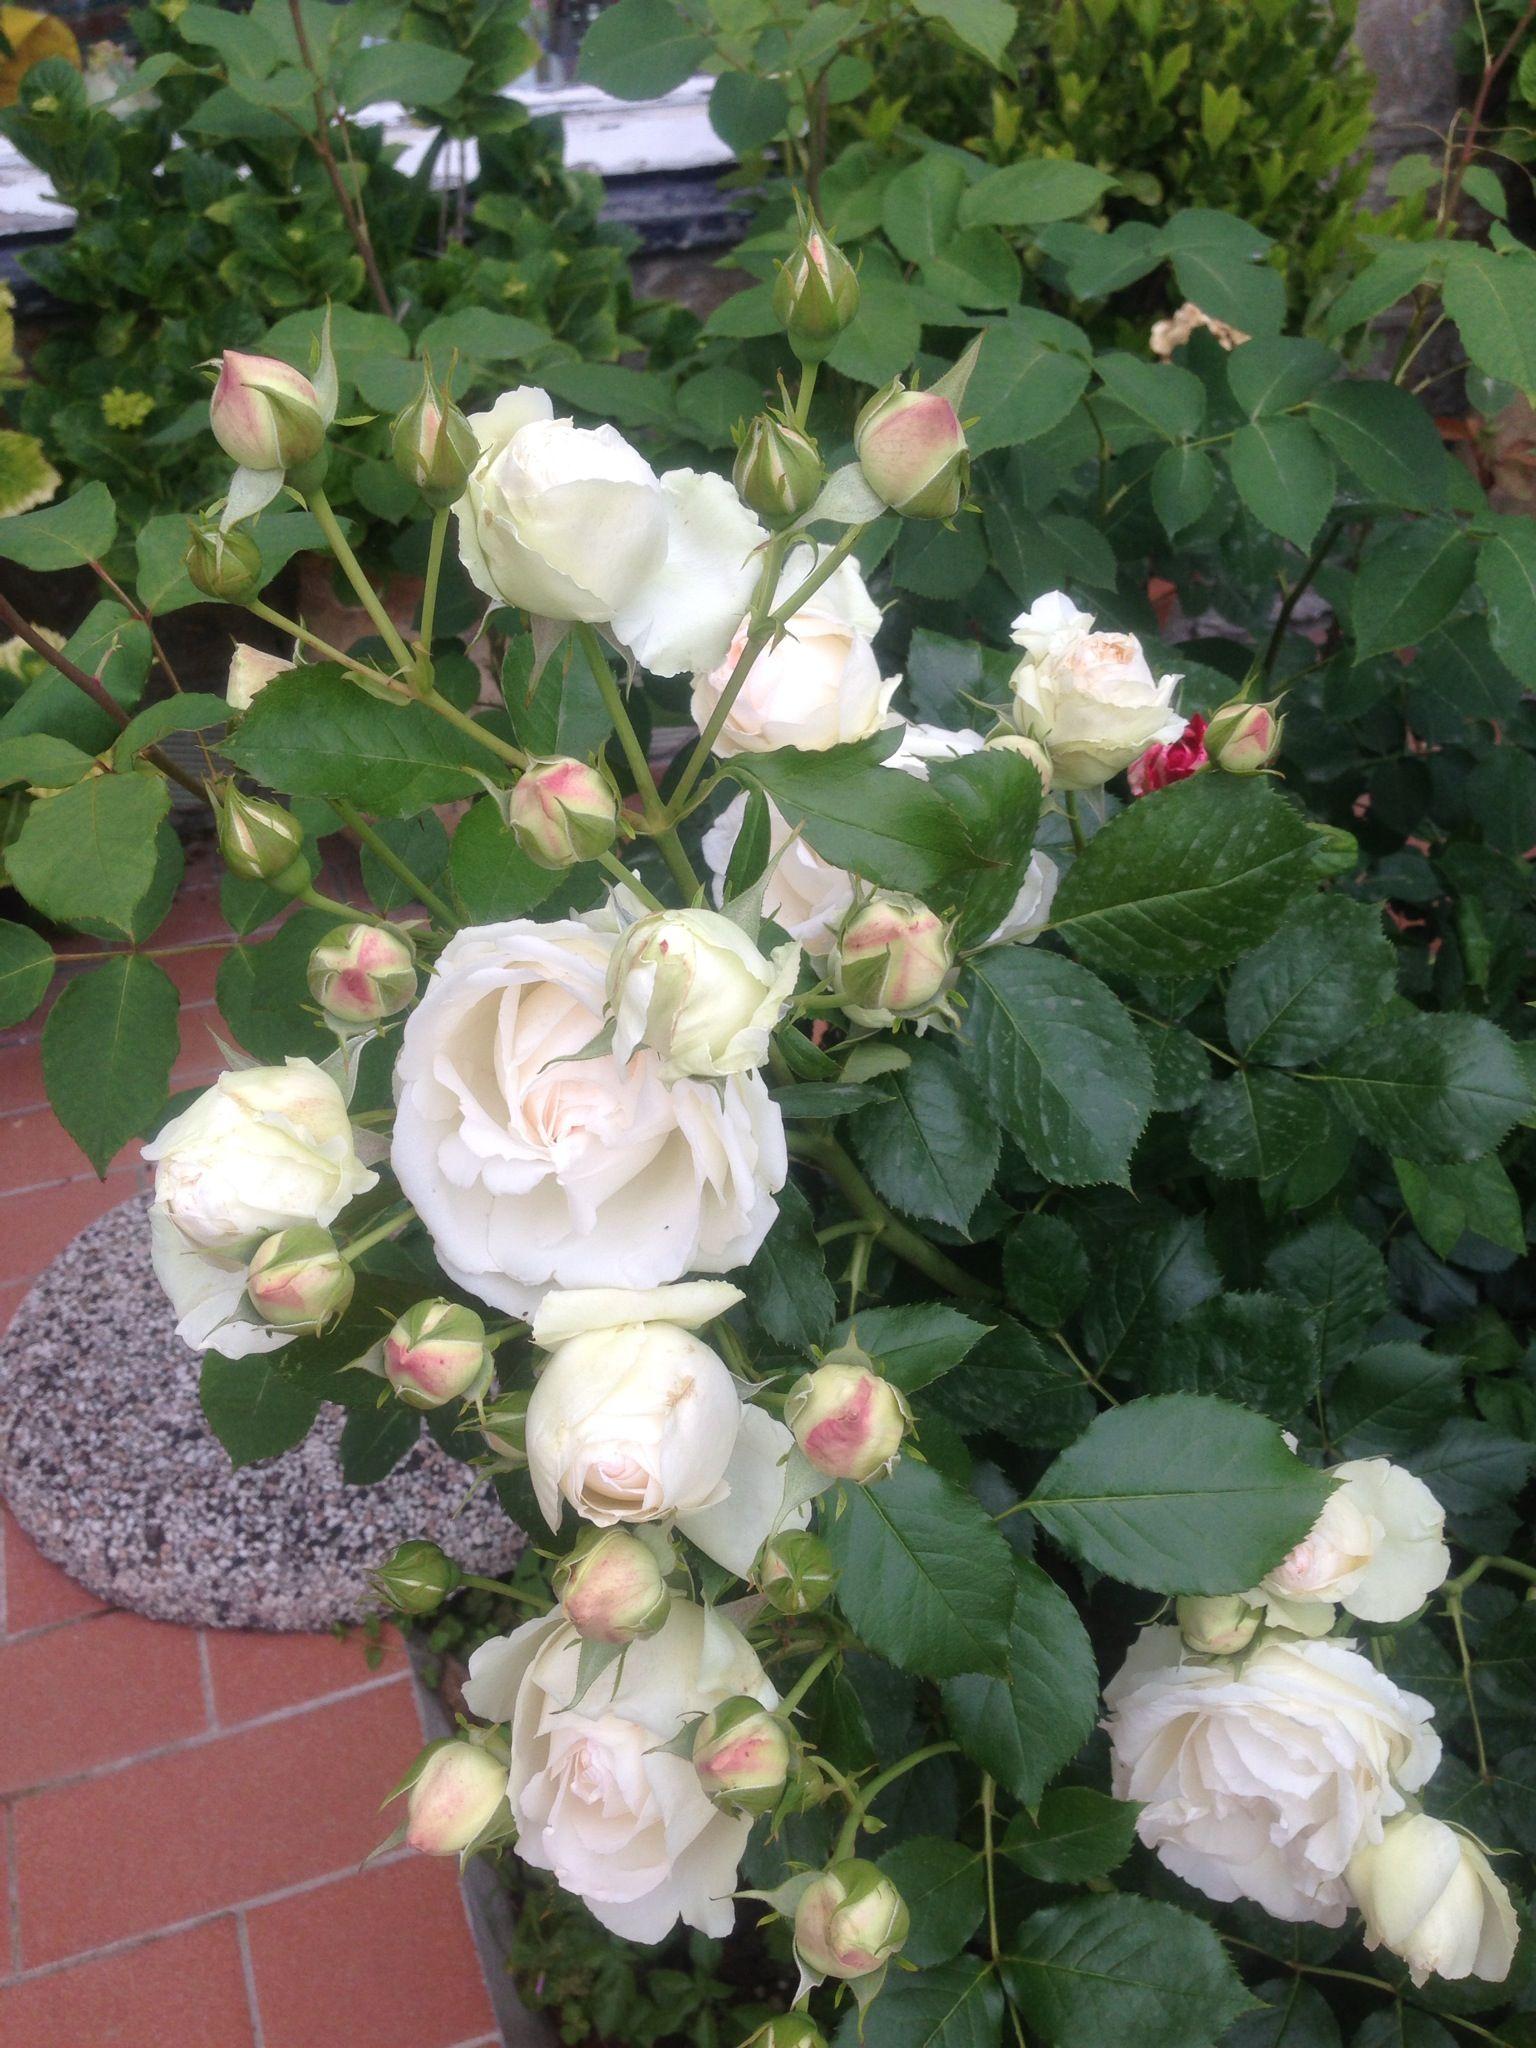 My roses in the garden